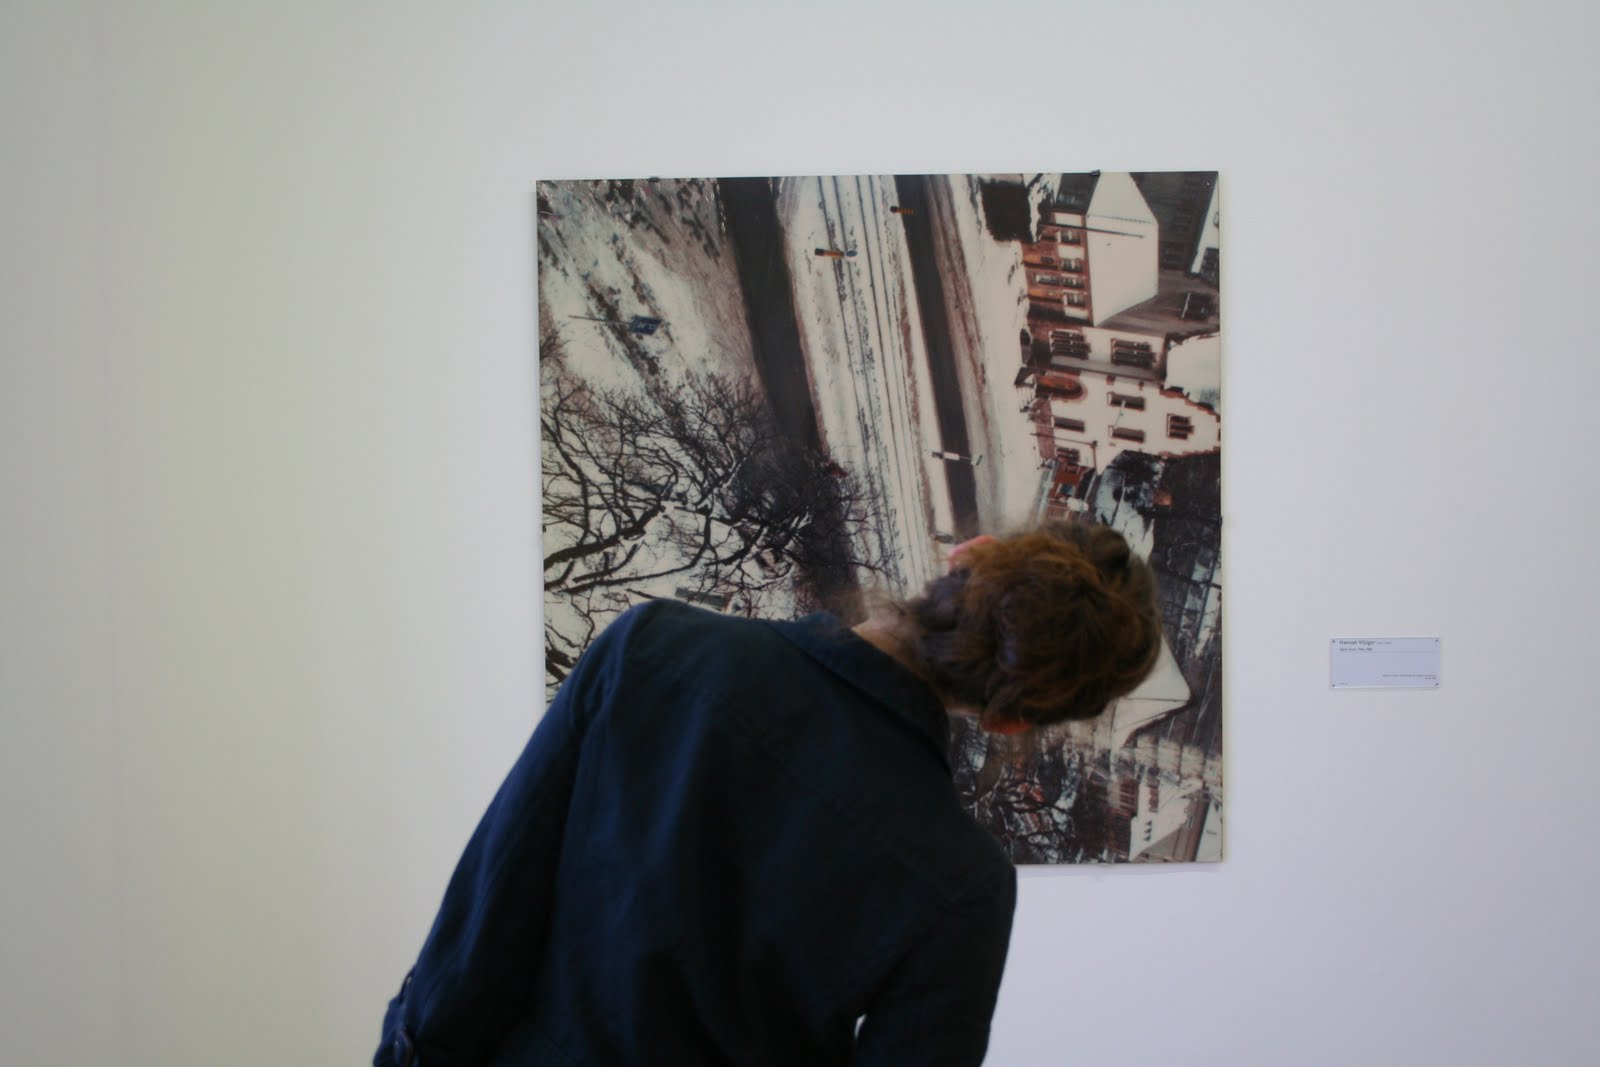 les d s sont pip s m is for modern art contemporary art